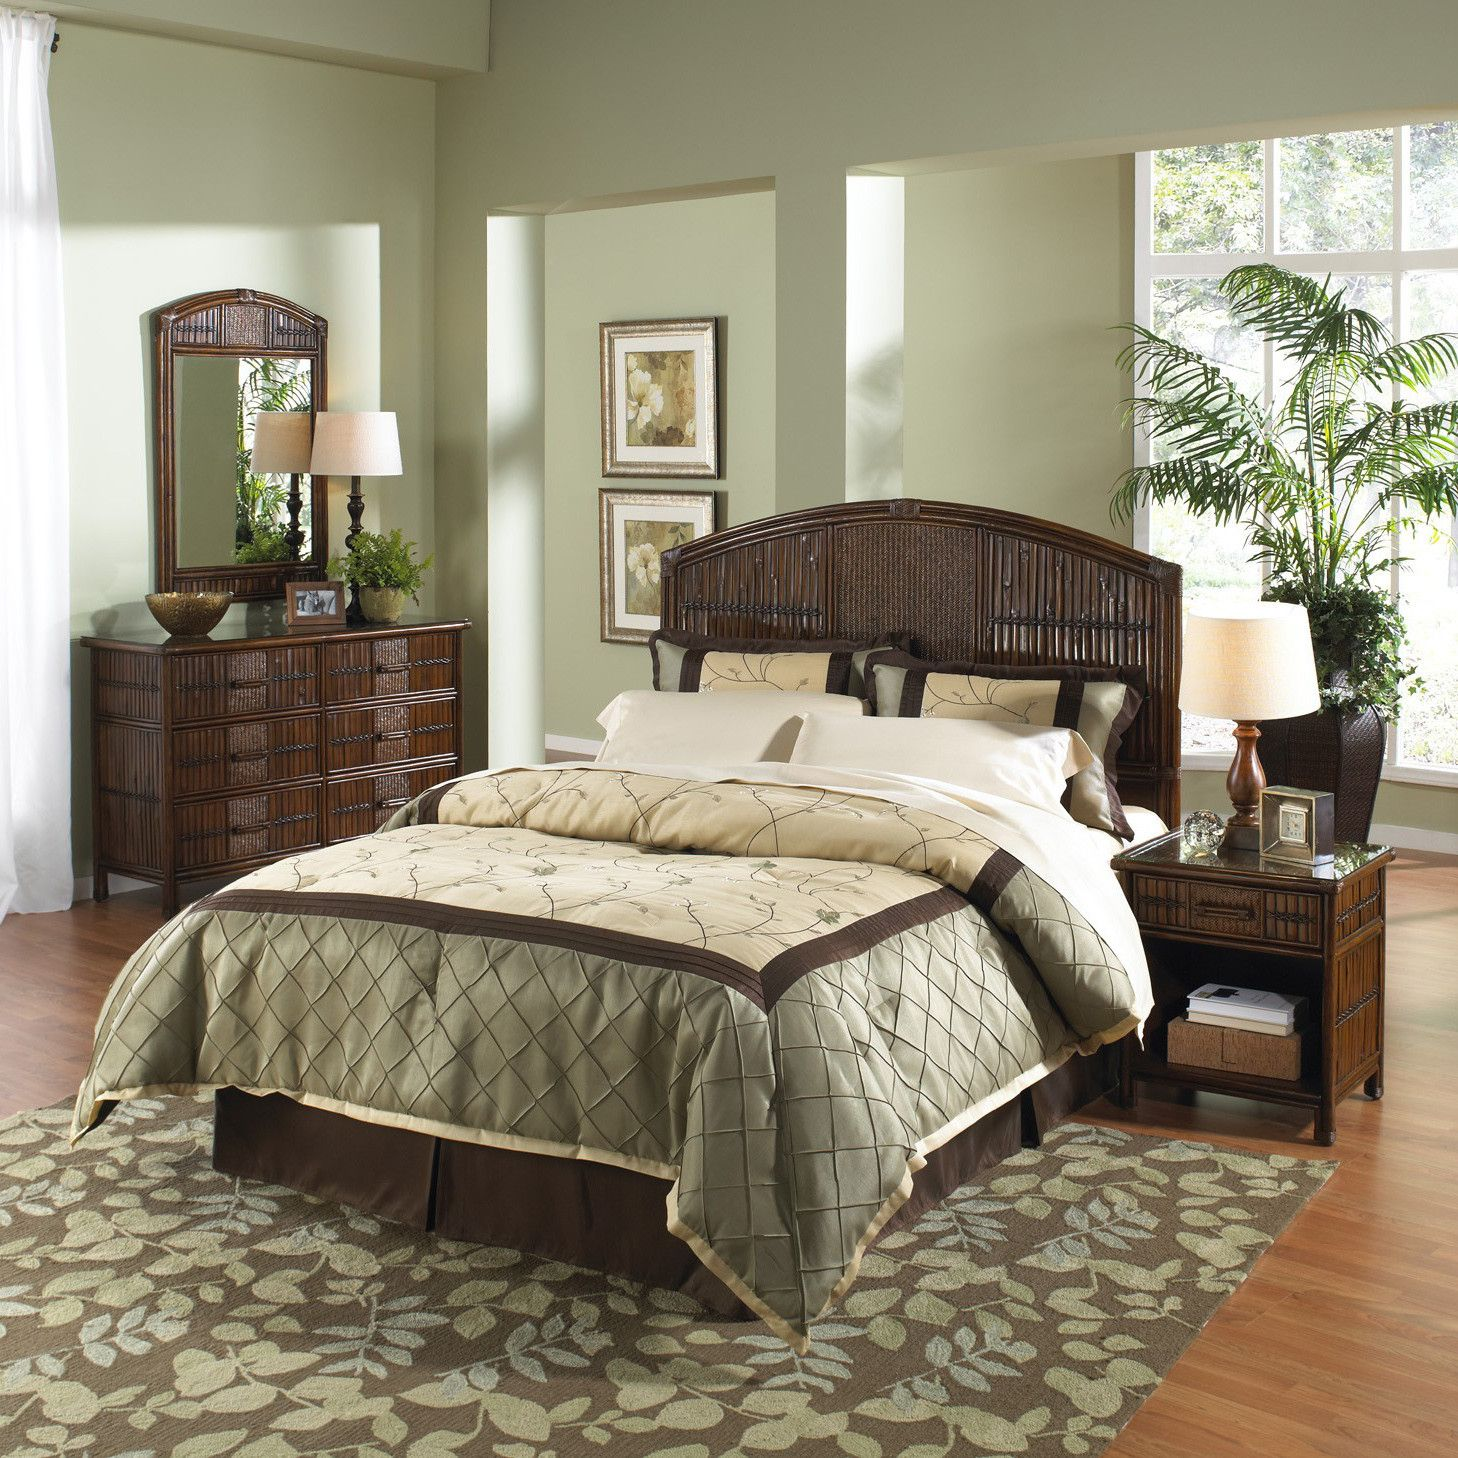 Hospitality Rattan Polynesian Panel 6 Piece Bedroom Set & Reviews